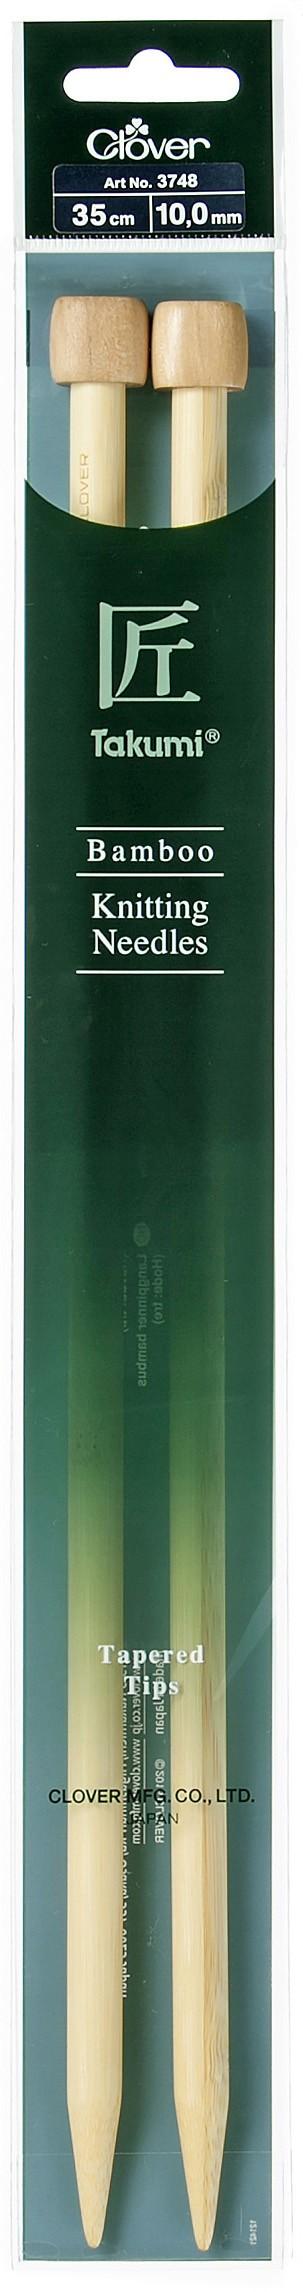 CLOVER Jackenstrickndl. Bambus Takumi 35cm/10.00mm